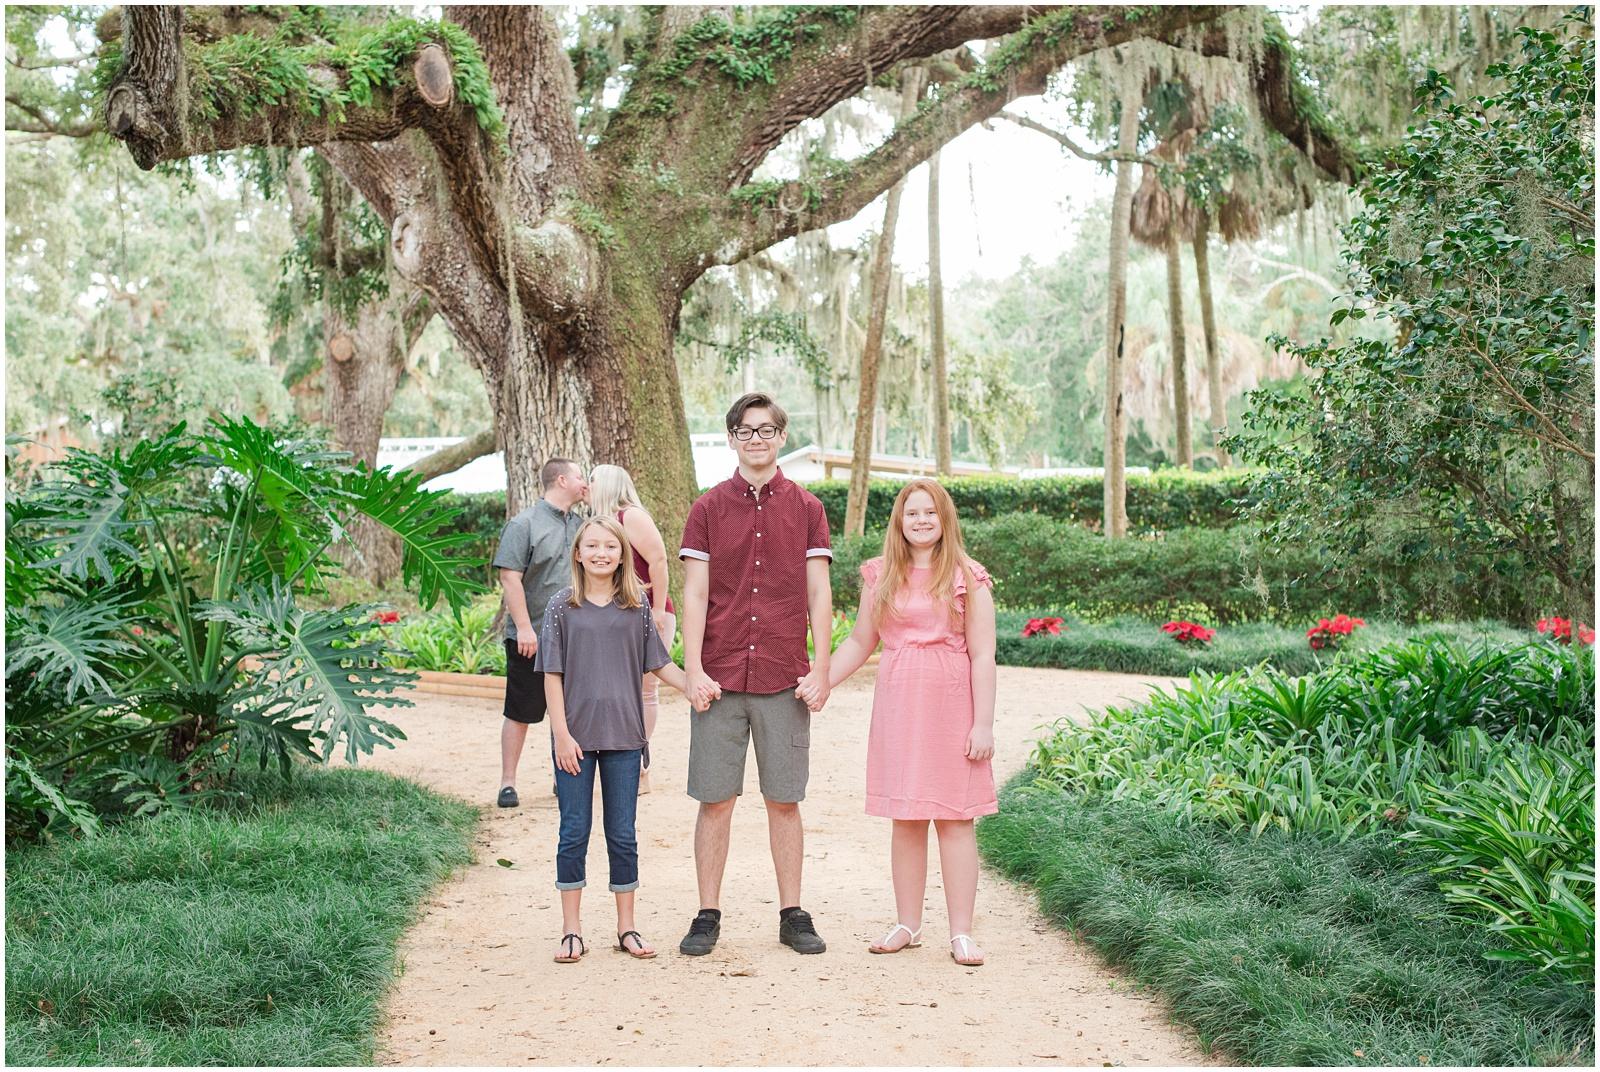 Washington Oaks_Garden_State Park_Beach_Family_Portraits_7.jpg